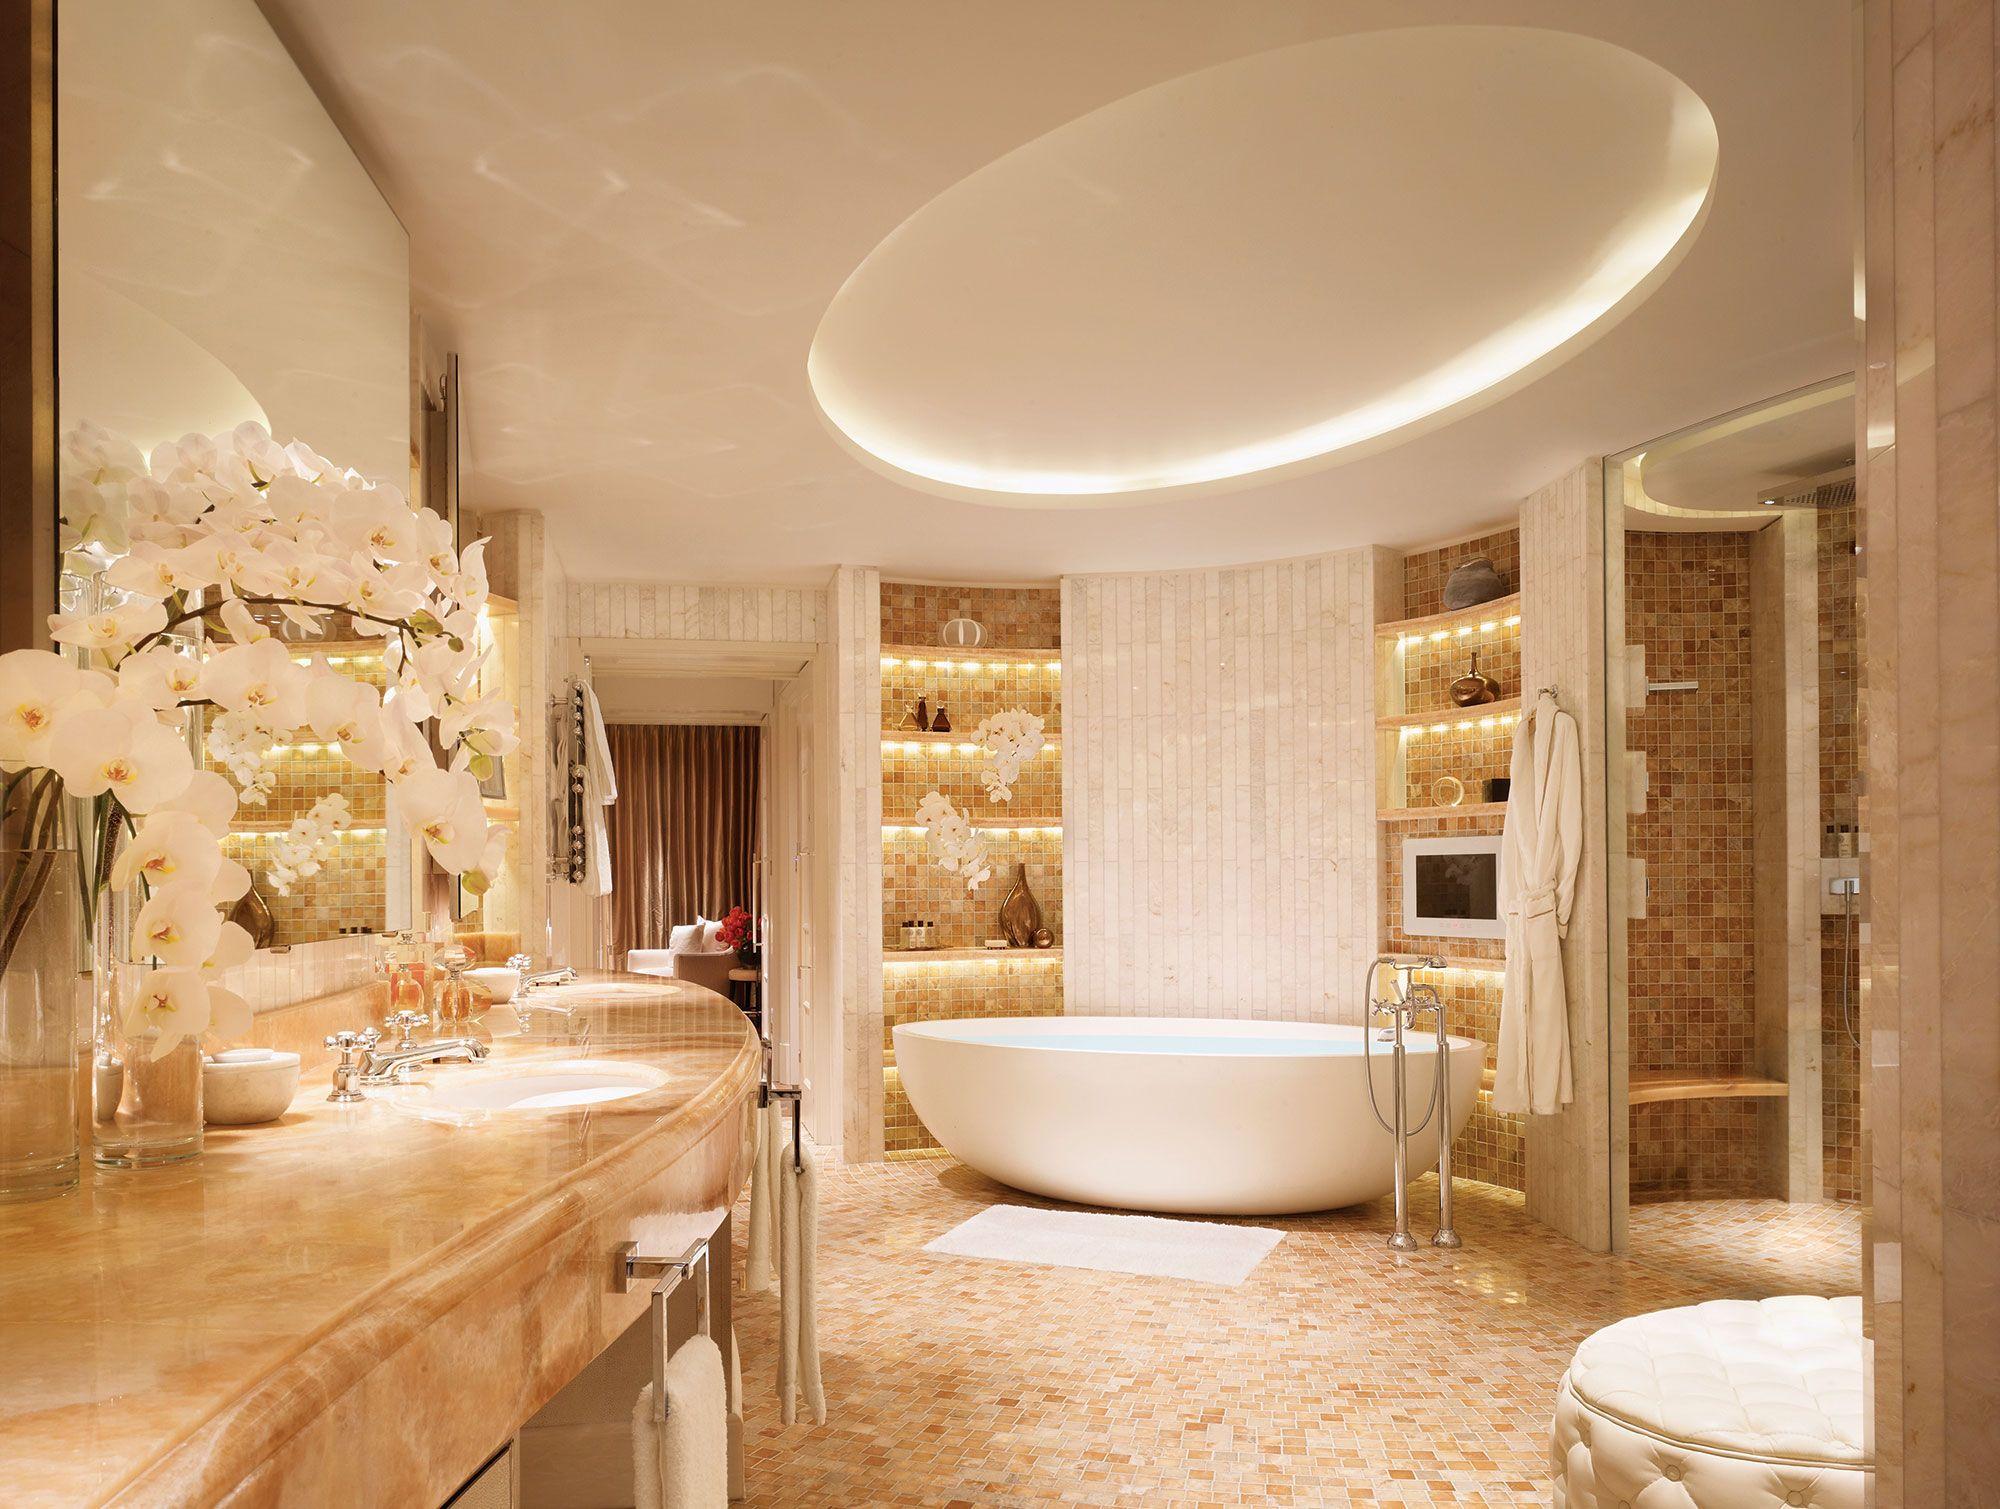 Corinthia Hotel London Penthouse Suite Luxus Badezimmer Luxusbadezimmer Badezimmer Design